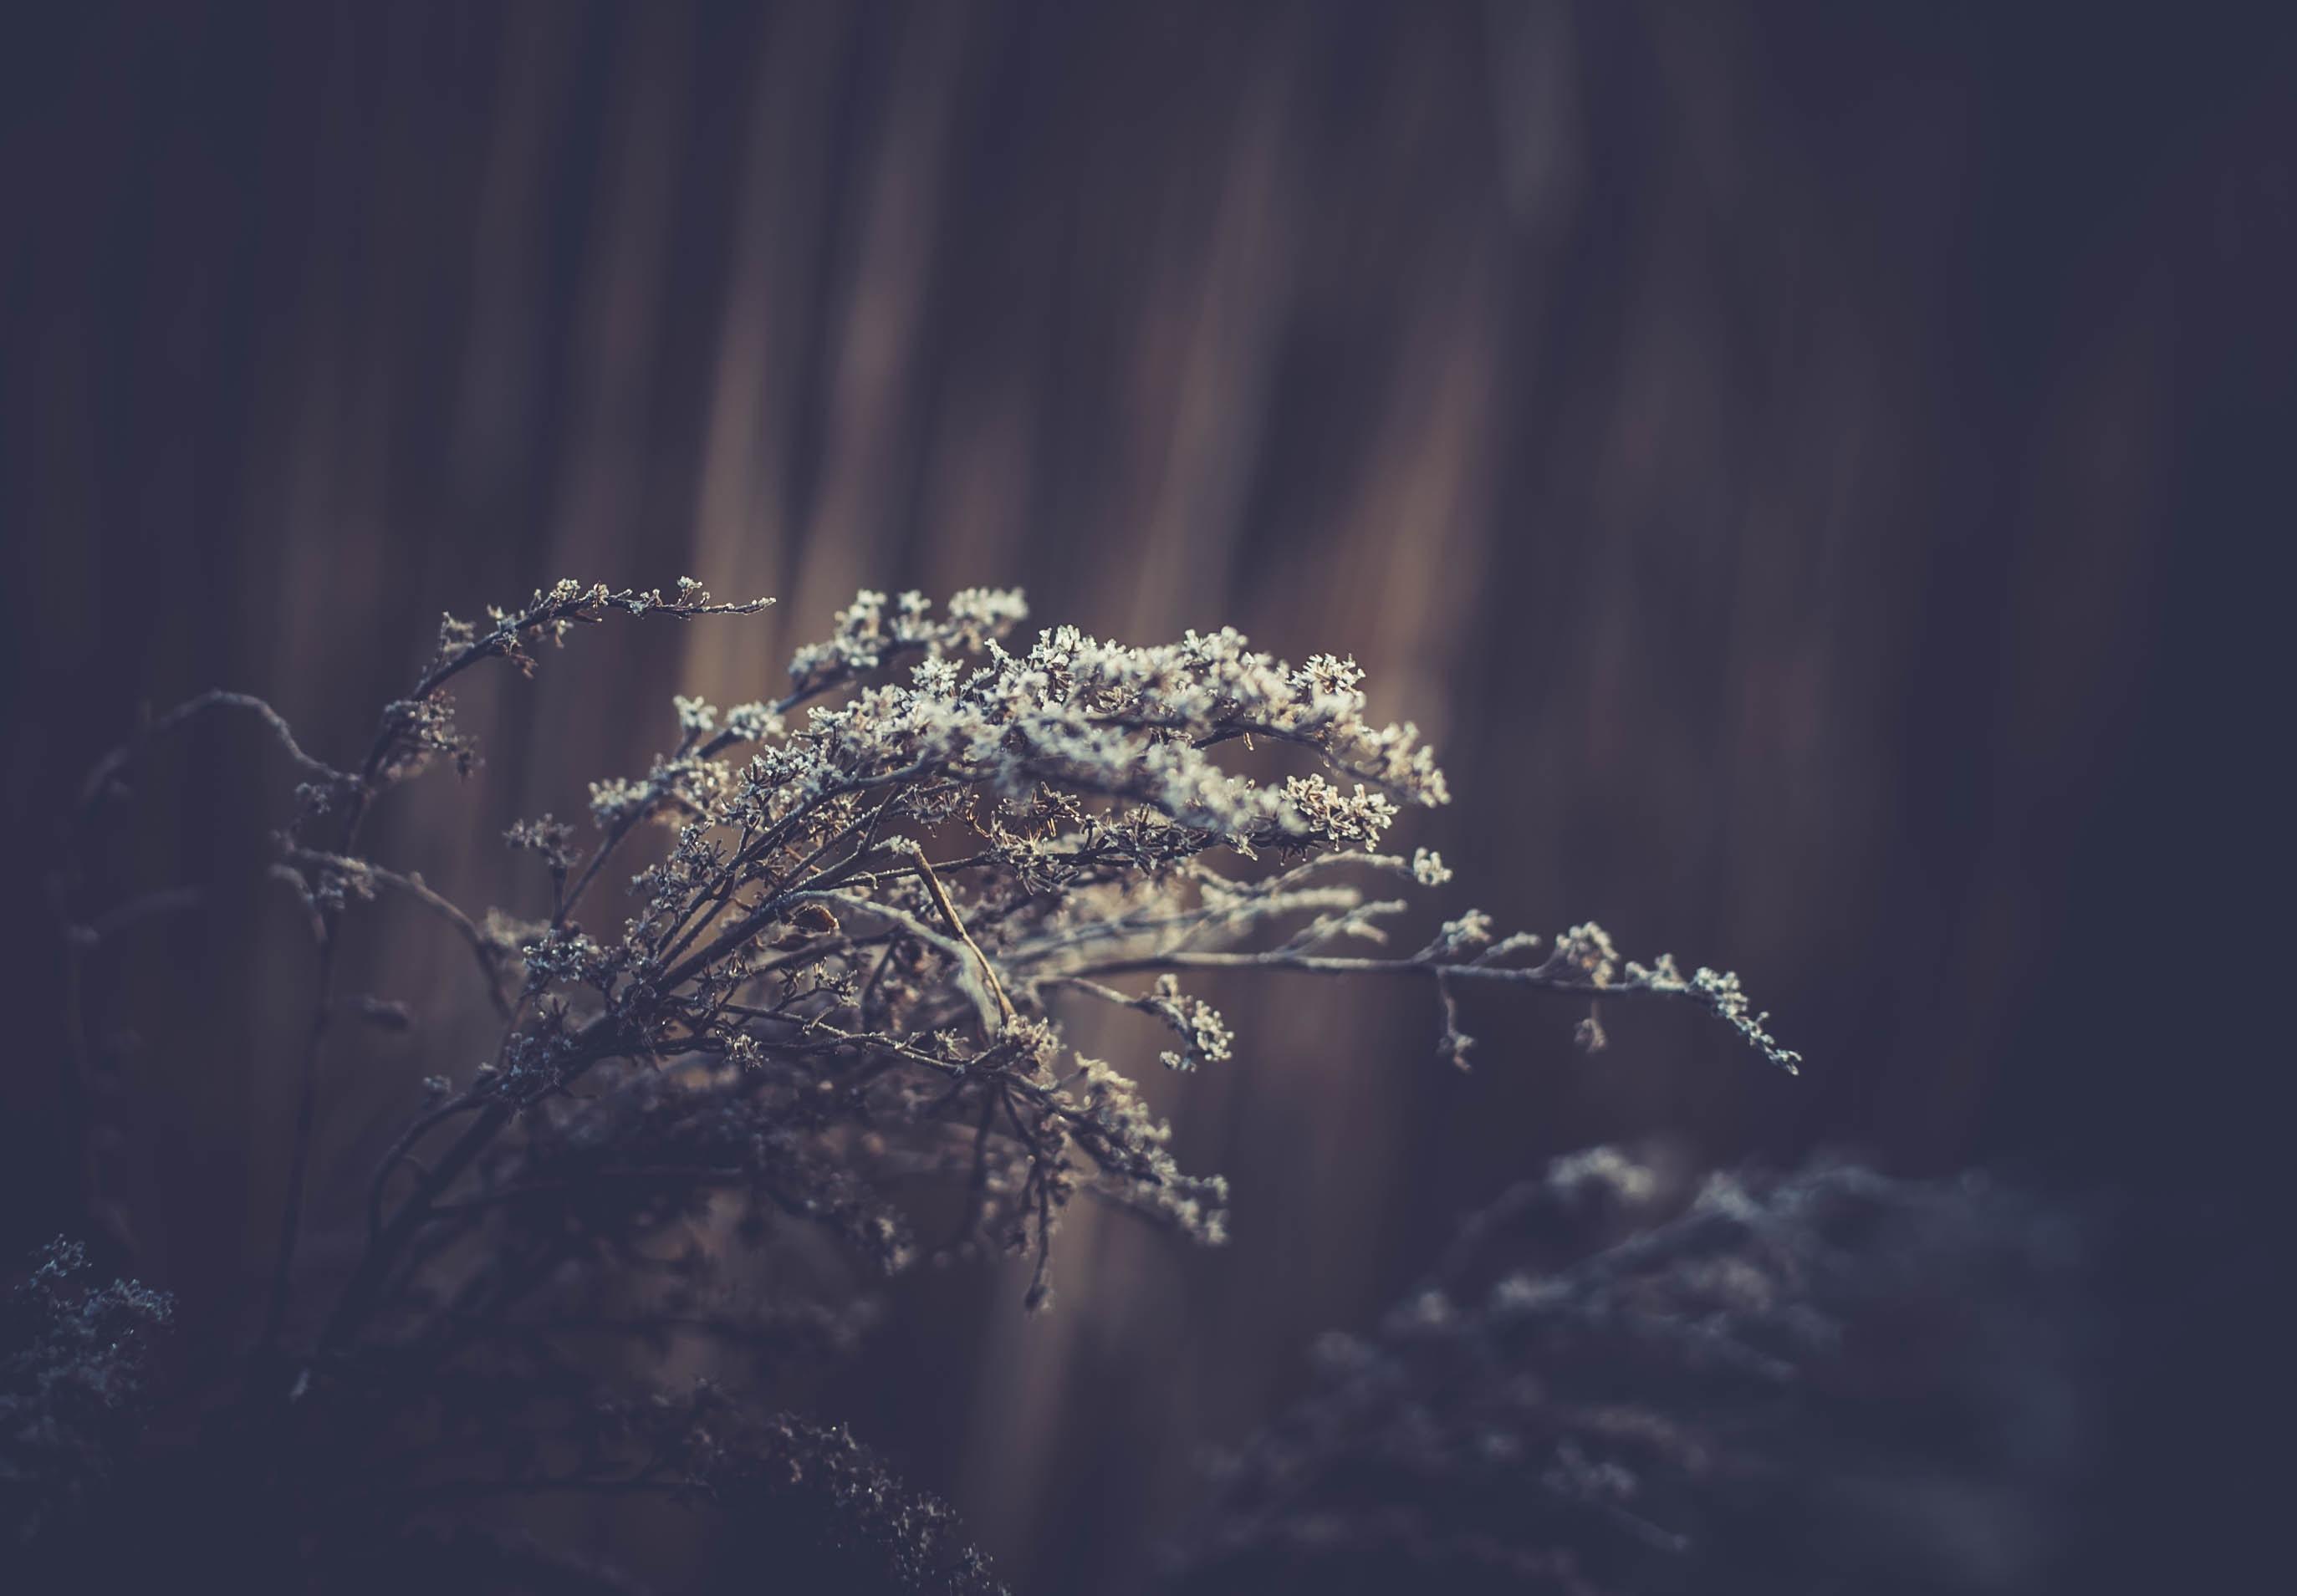 green leafed tree in tilt shift lens photography